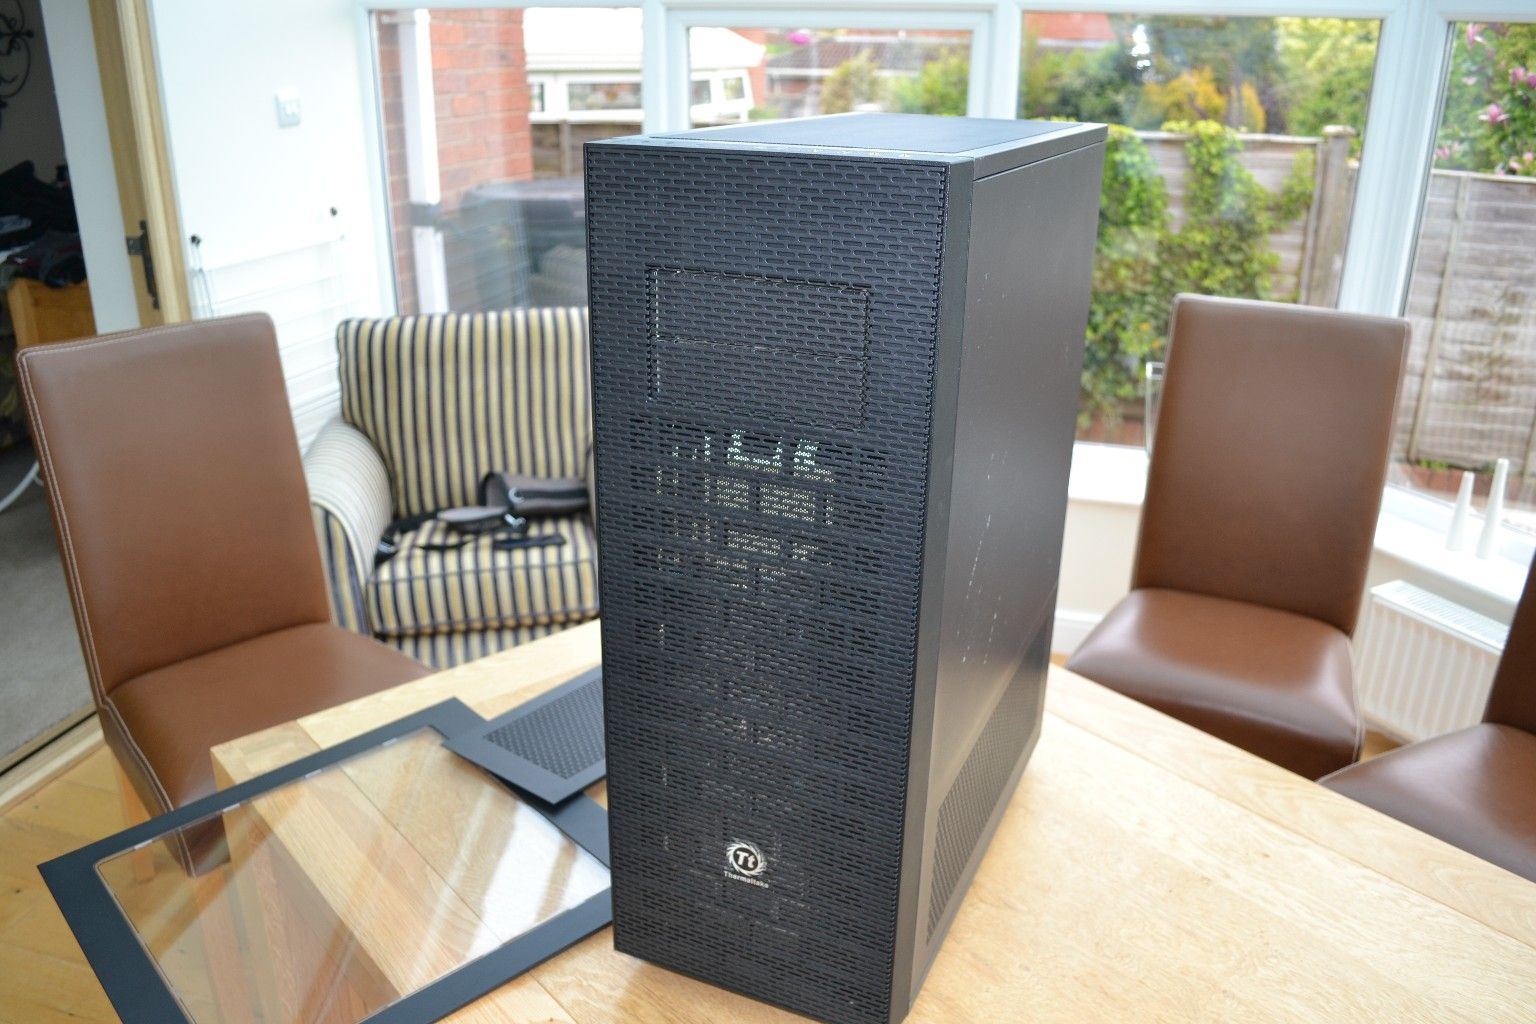 Sims 3 Design Garten Accessoires Neu Pc Case thermaltake X71